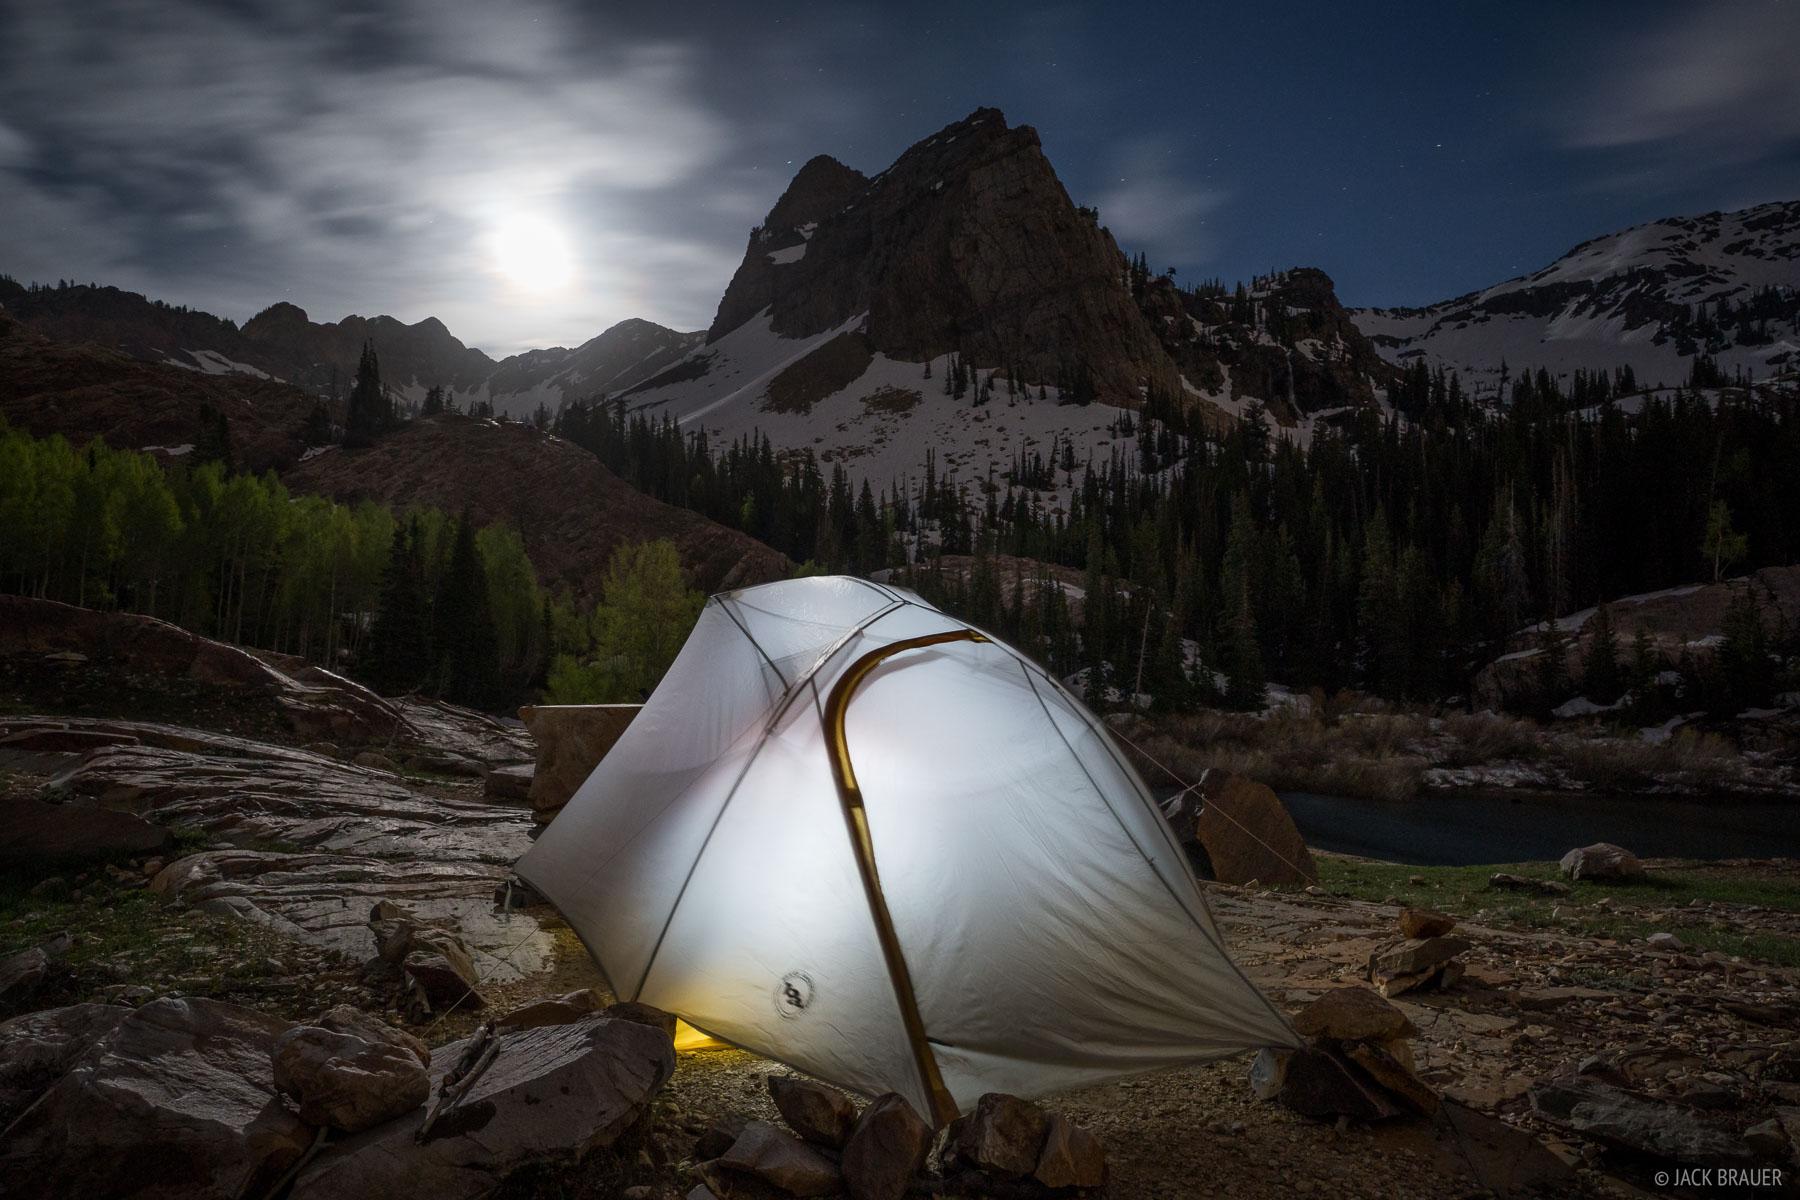 Lake Blanche, Sundial Peak, Twin Peaks Wilderness, Utah, Wasatch Range, moonlight, tent, photo